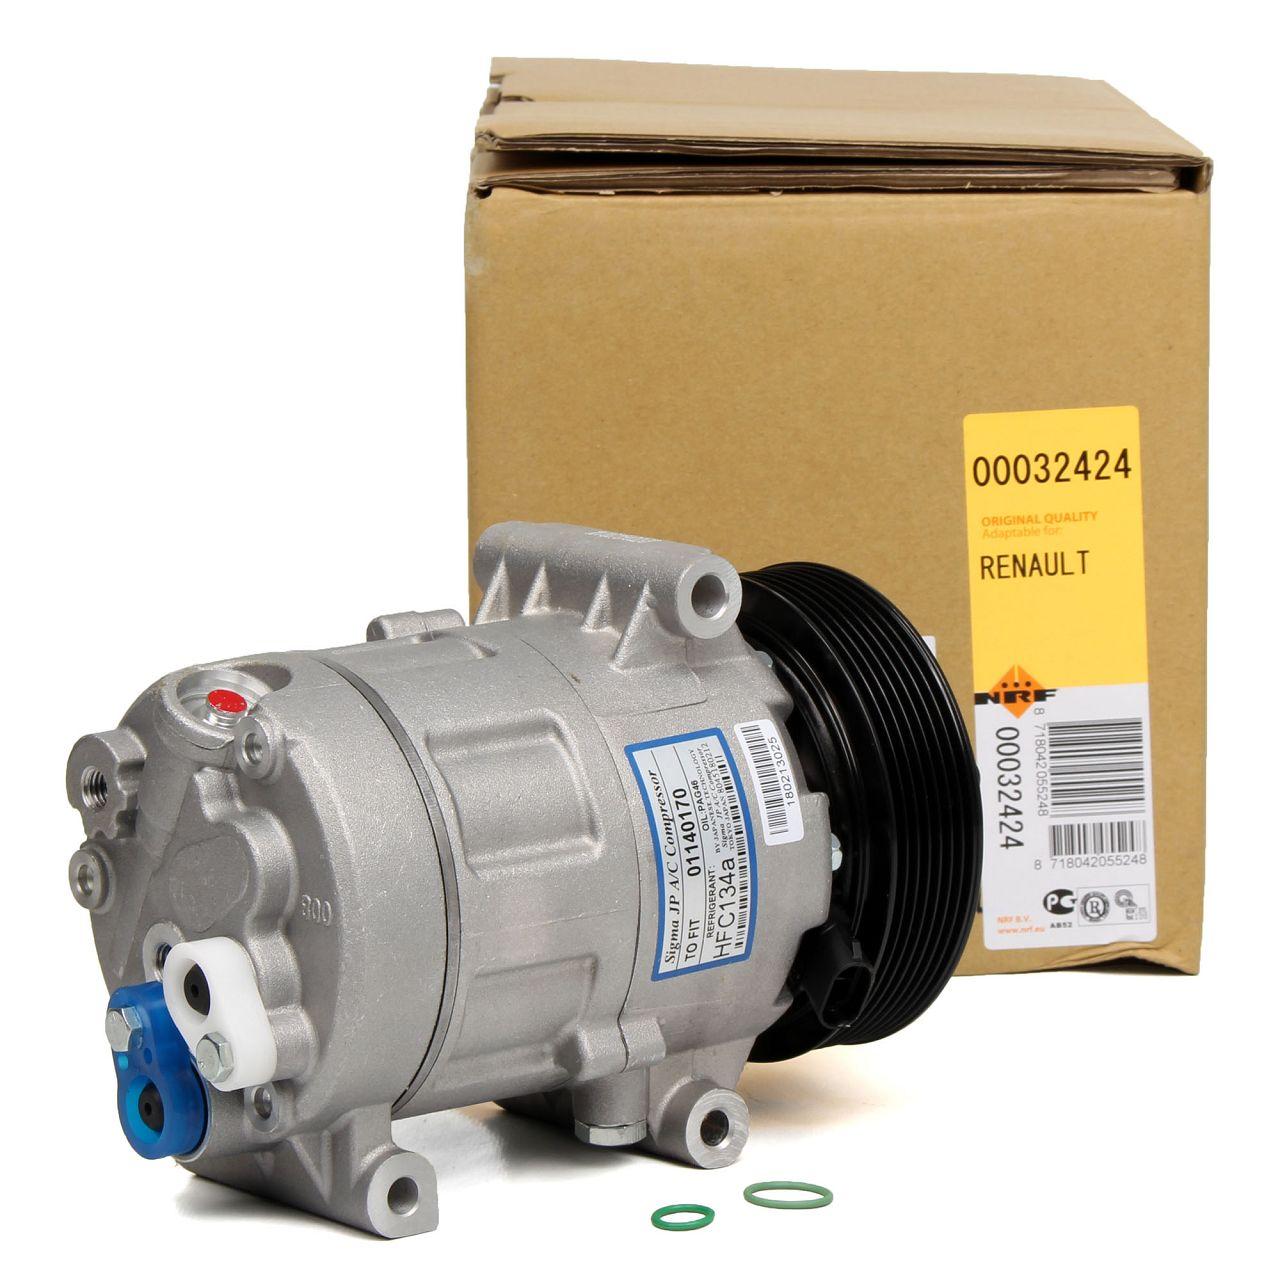 NRF 32424 Kompressor Klimaanlage EASY FIT für RENAULT MEGANE II SCENIC I II